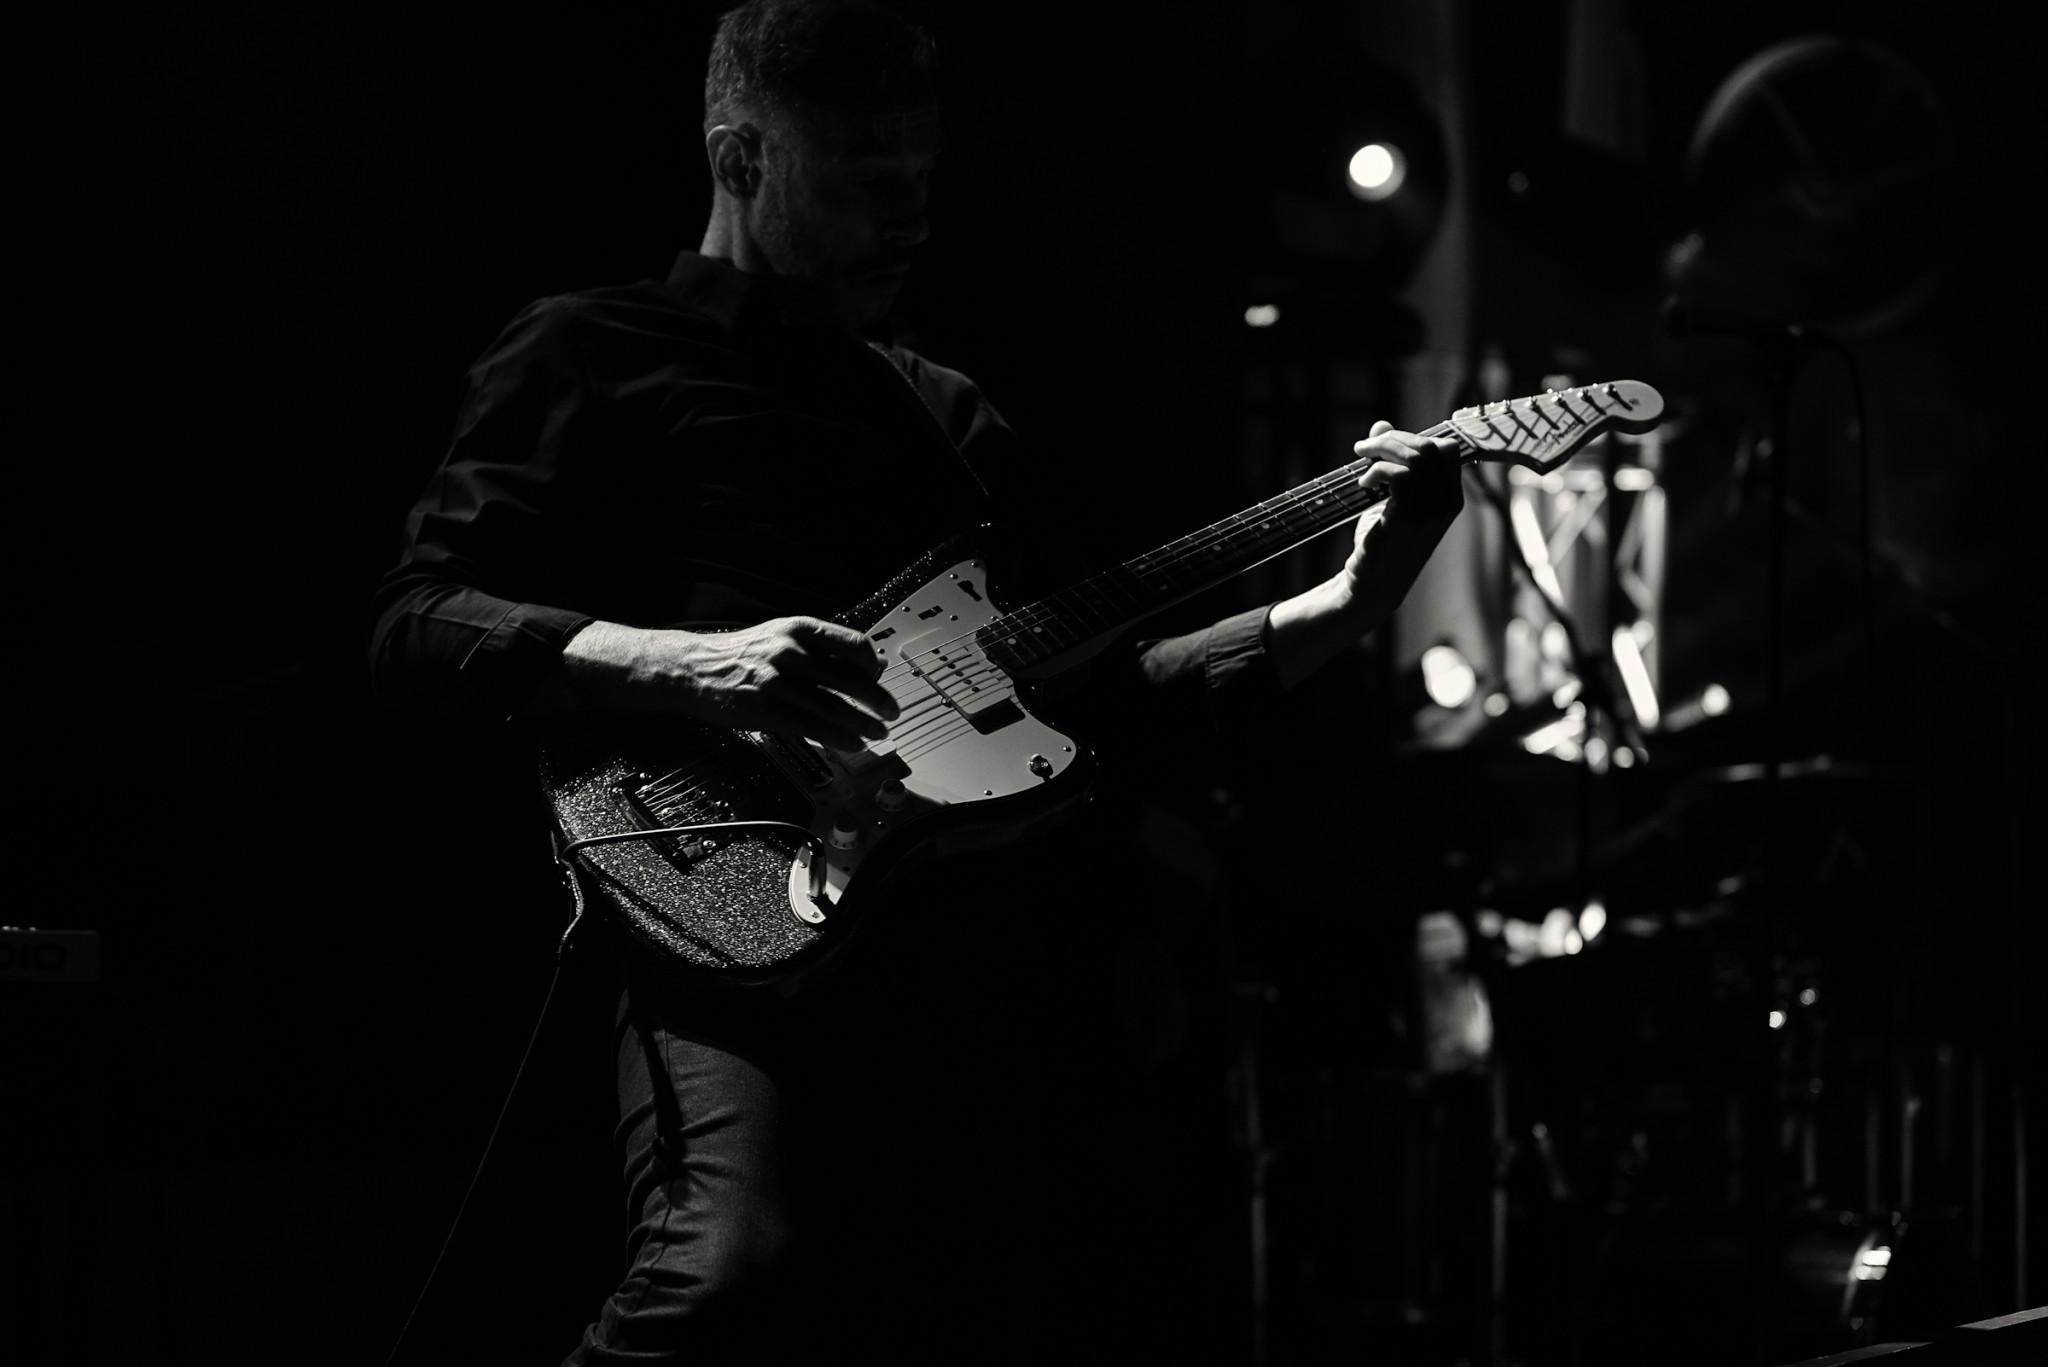 Lefki Symphonia Live At Lab Art, Volos 16.03.2018 photo by Miltos Kostoulas